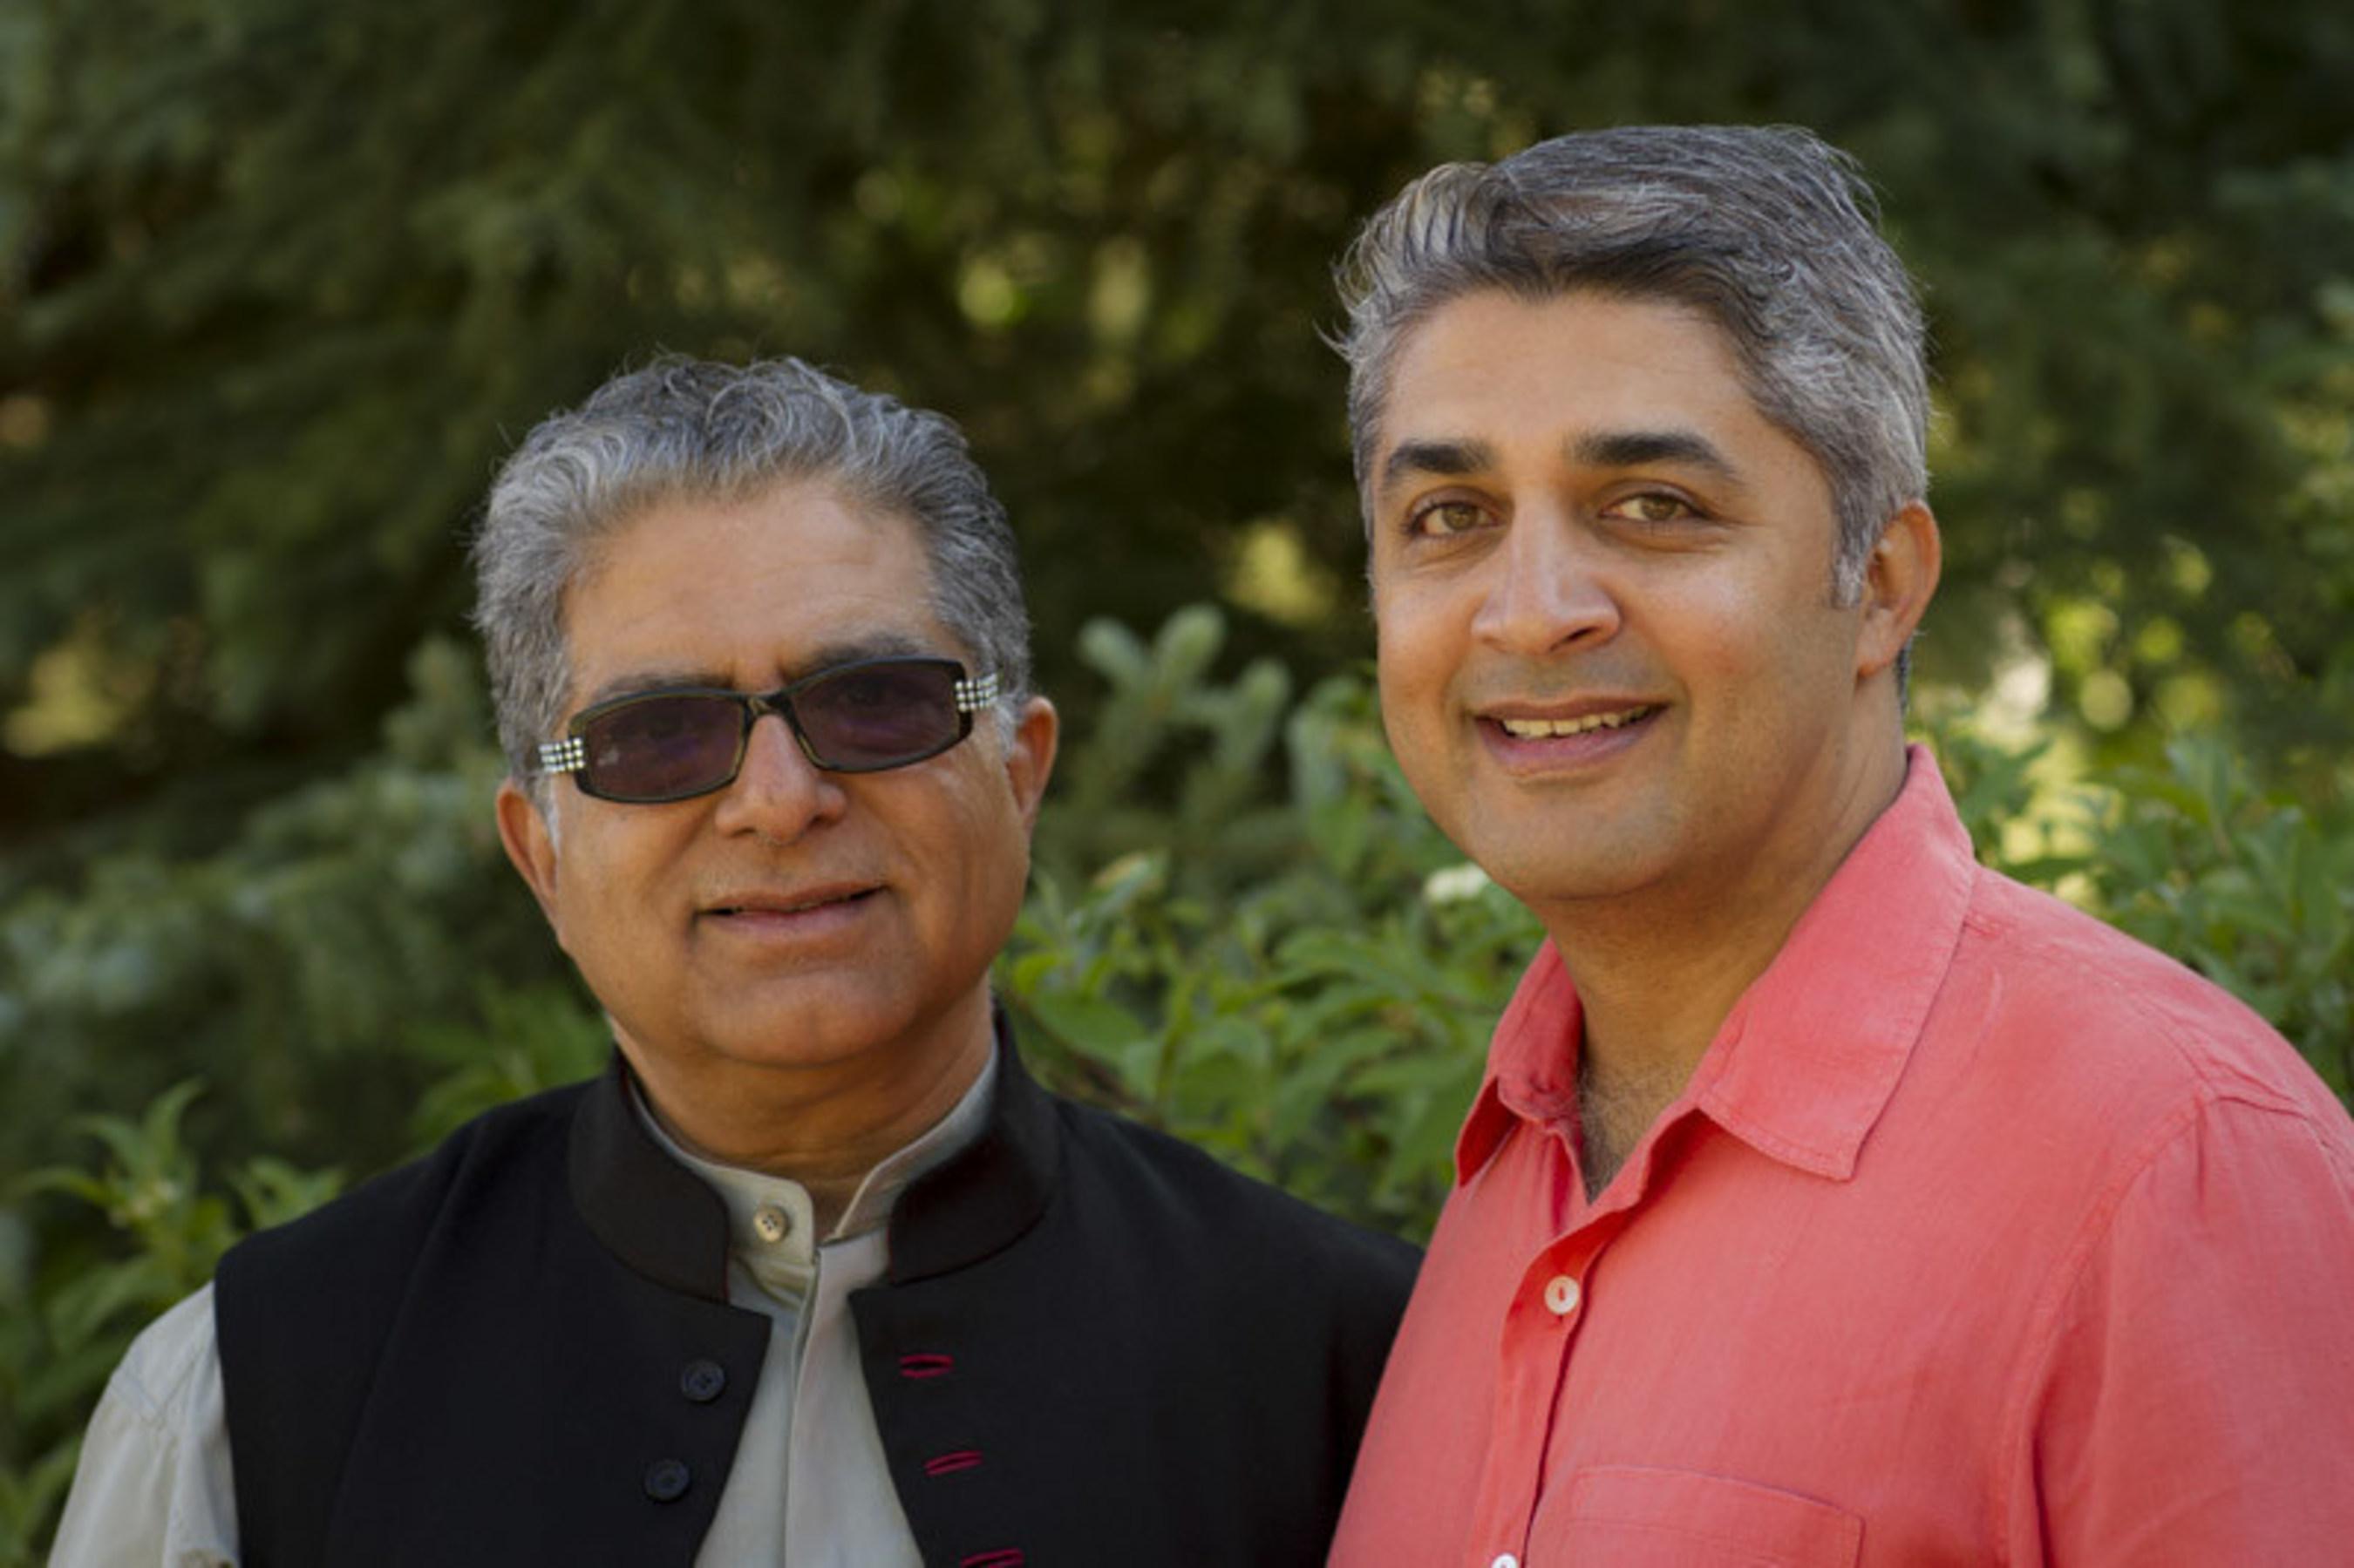 Deepak Chopra, M.D., world-renowned physician, best selling author & Poonacha Machaiah, entrepreneur and technology expert.